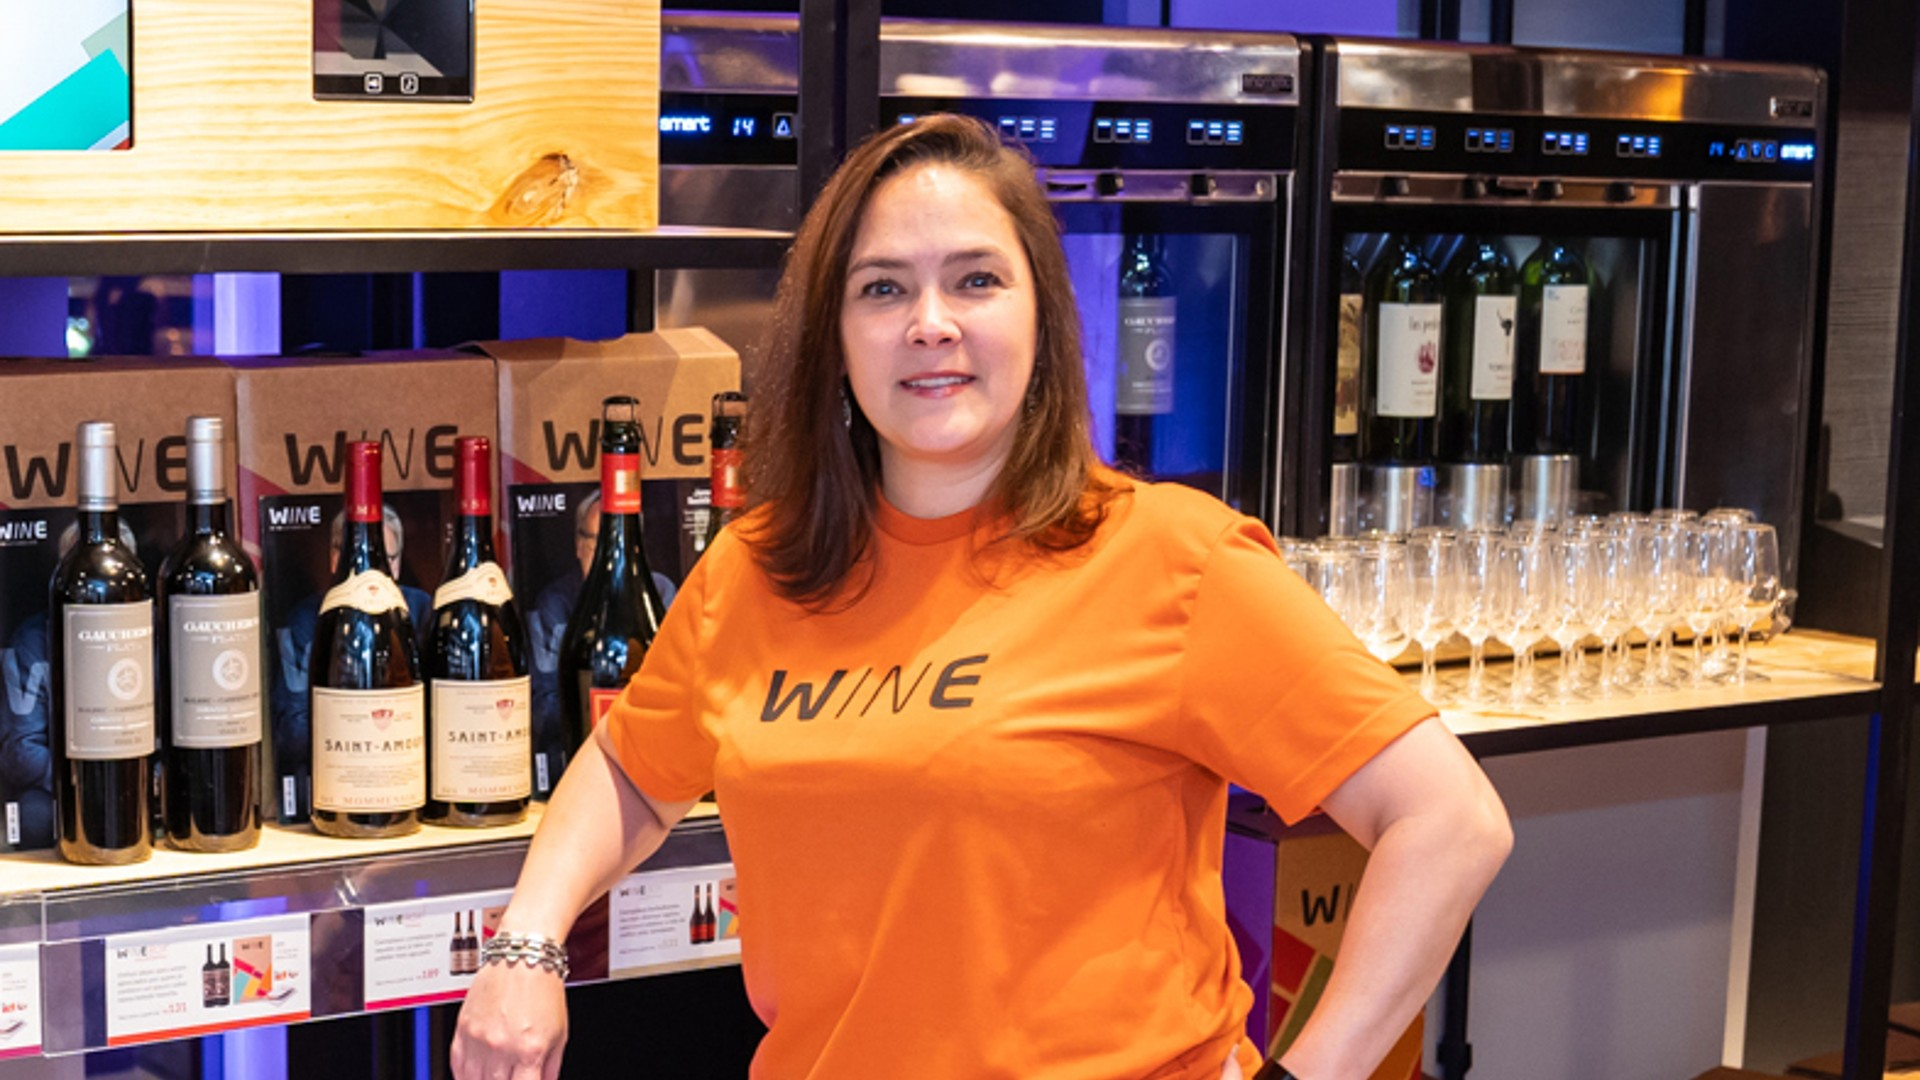 Nativa digital, Wine proporciona experiência conectada na loja física